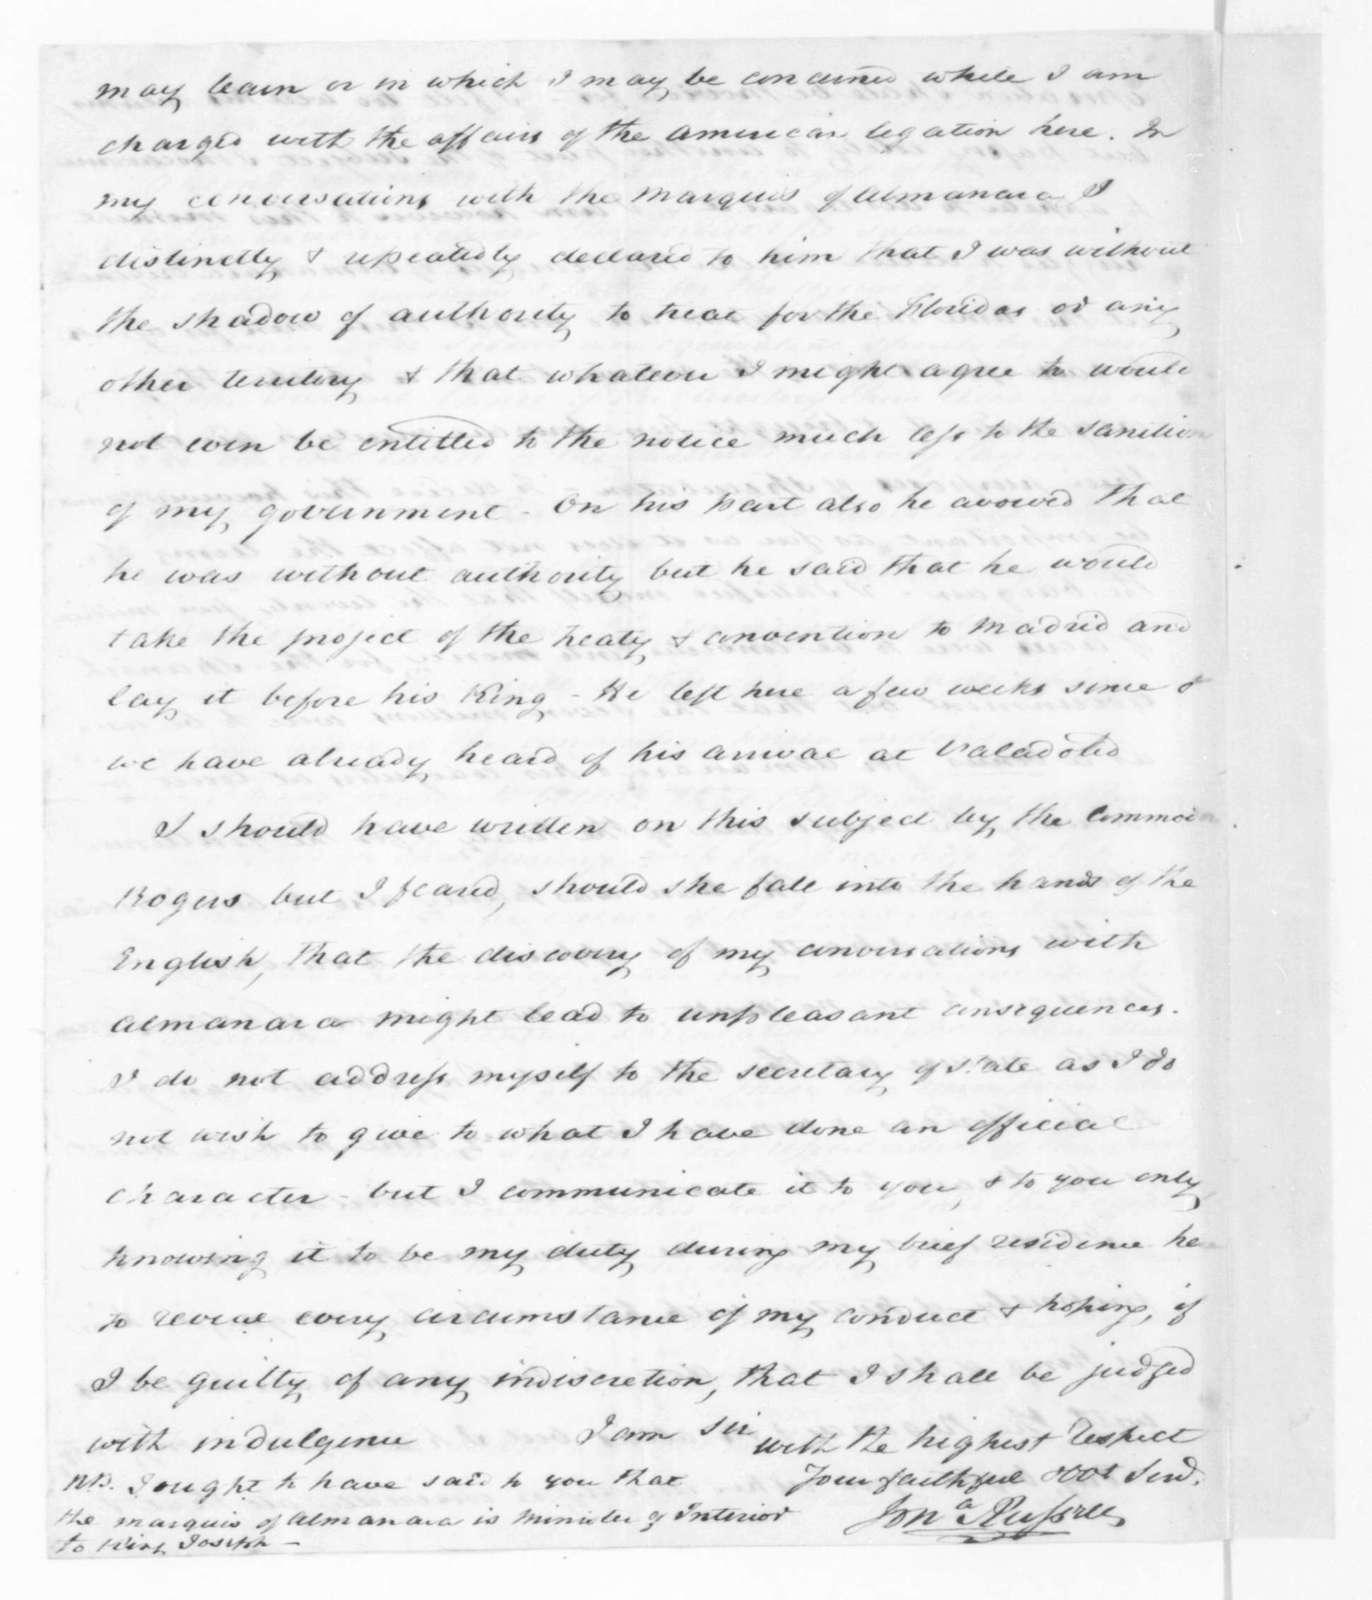 Jonathan Russell to James Madison, January 2, 1811.